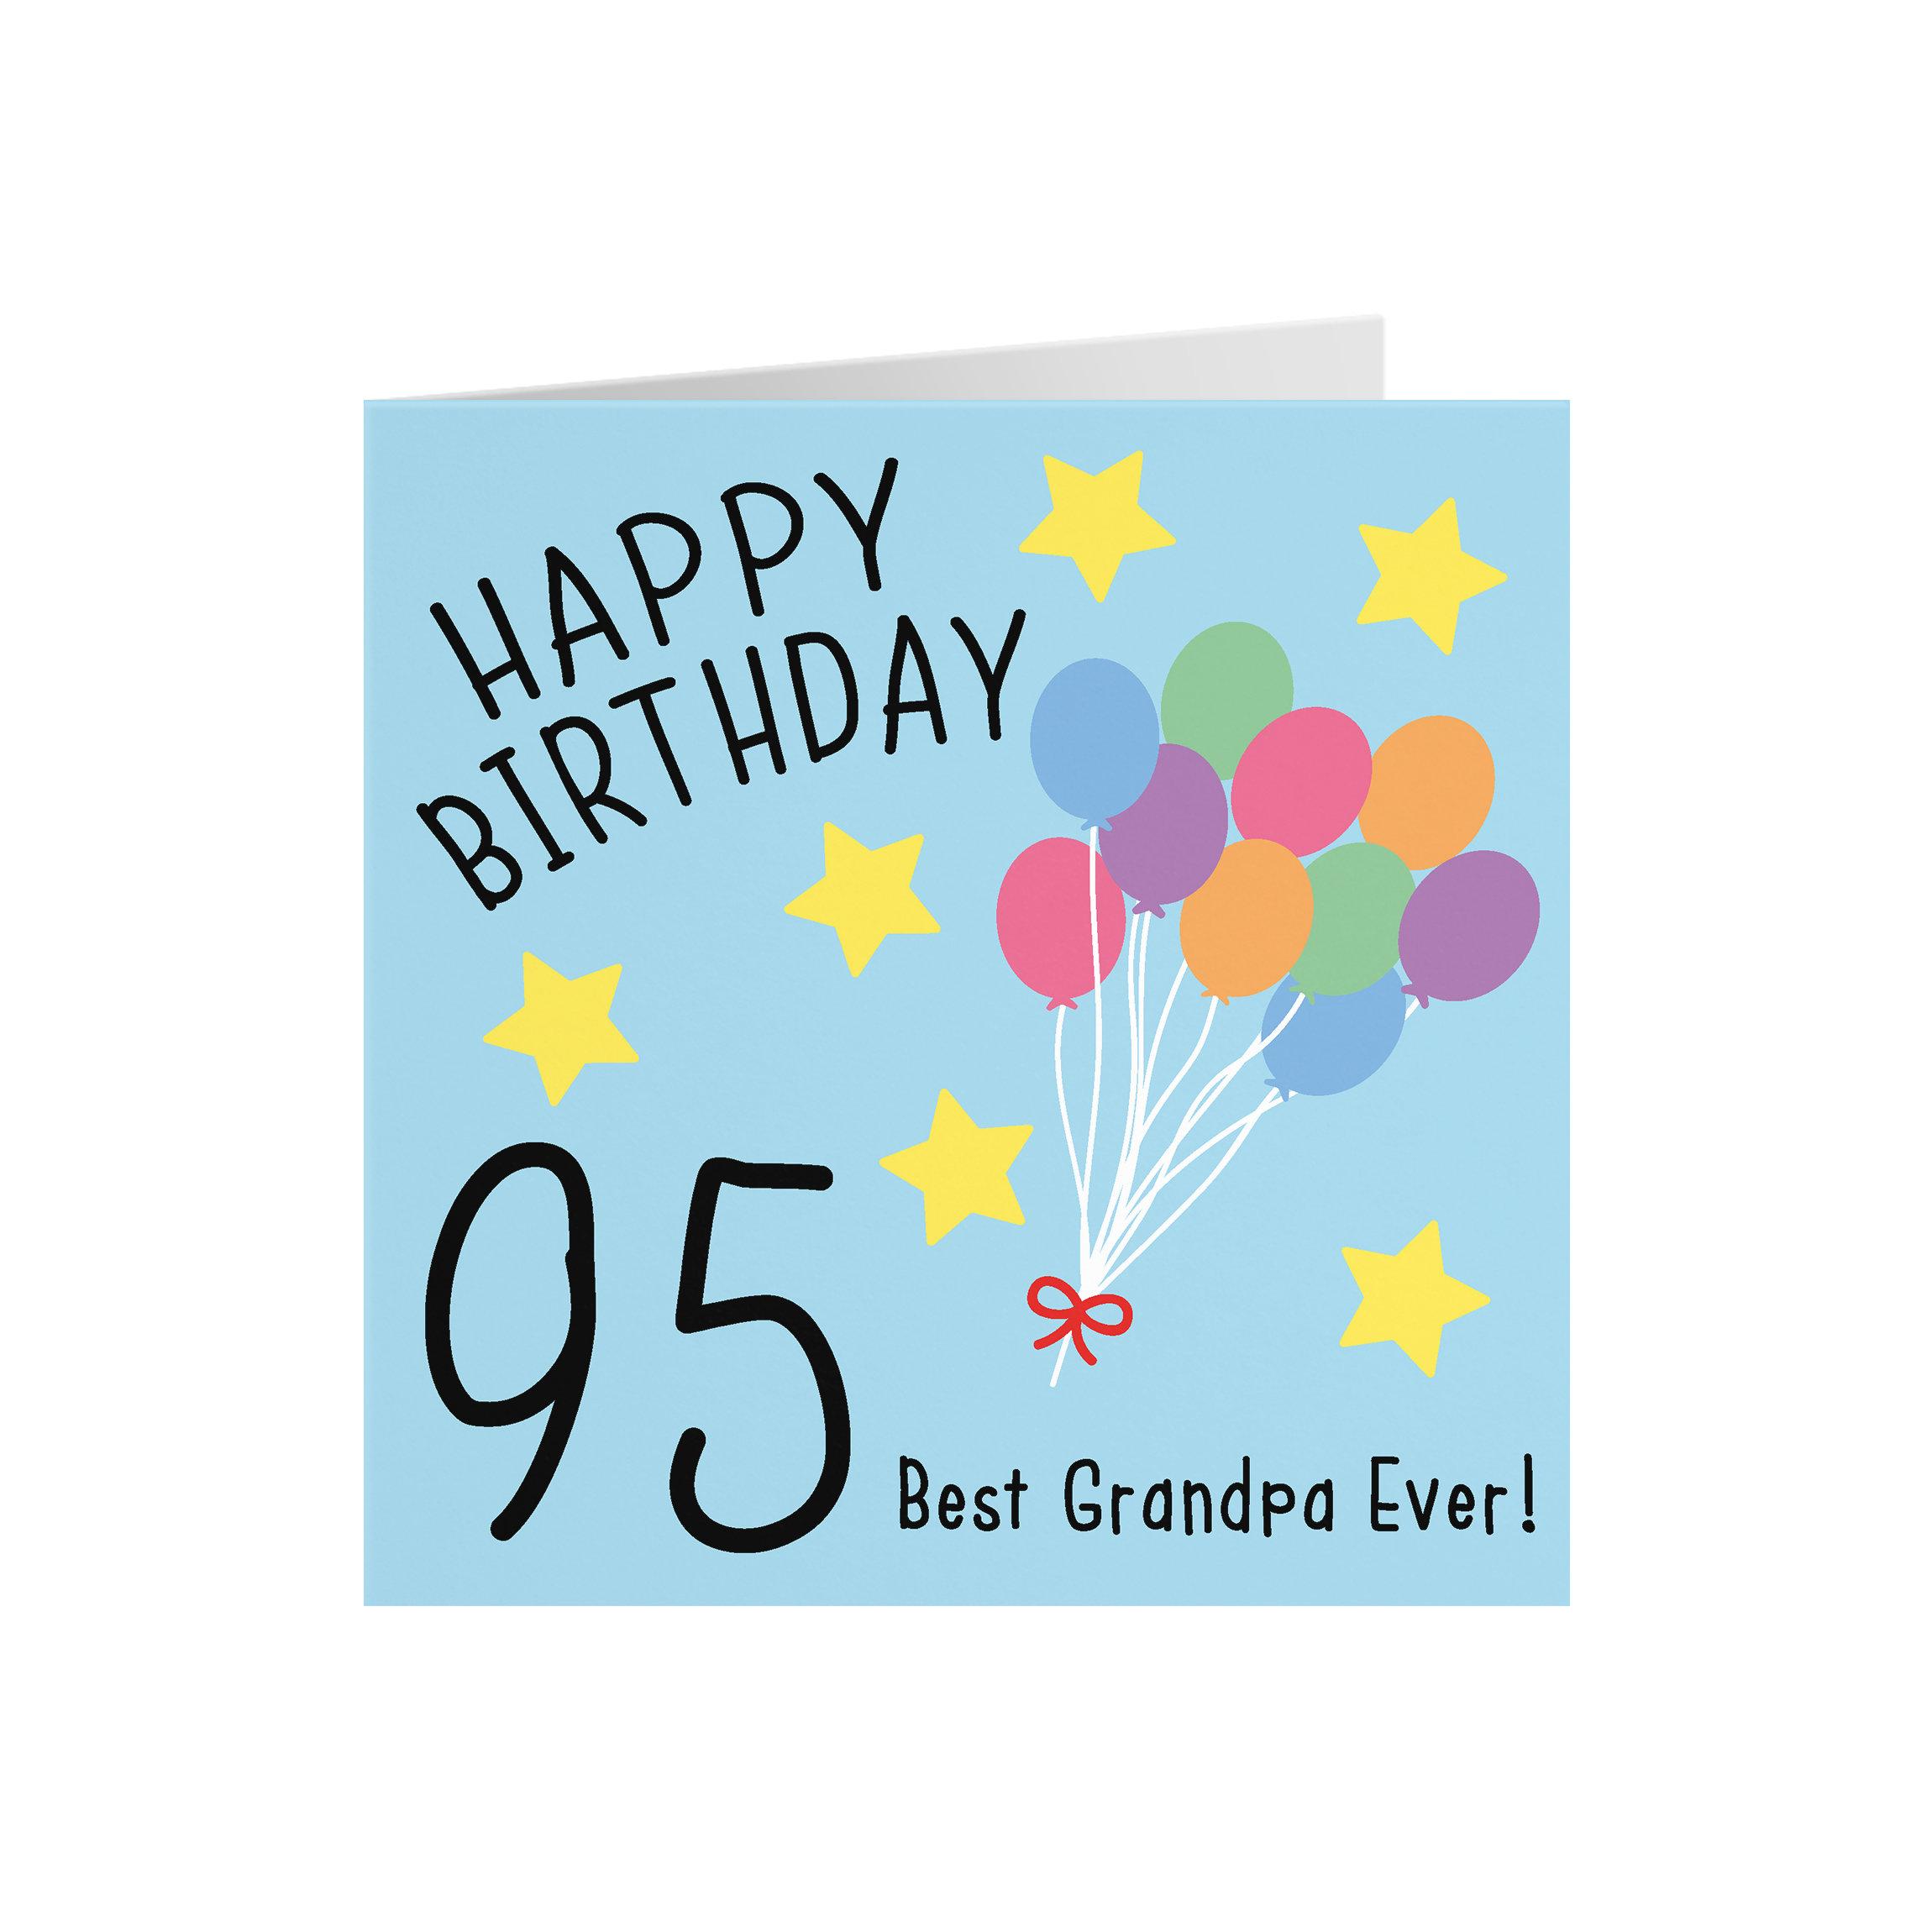 Grandpa 95th Birthday Card Happy Birthday 95 Best Grandpa Etsy